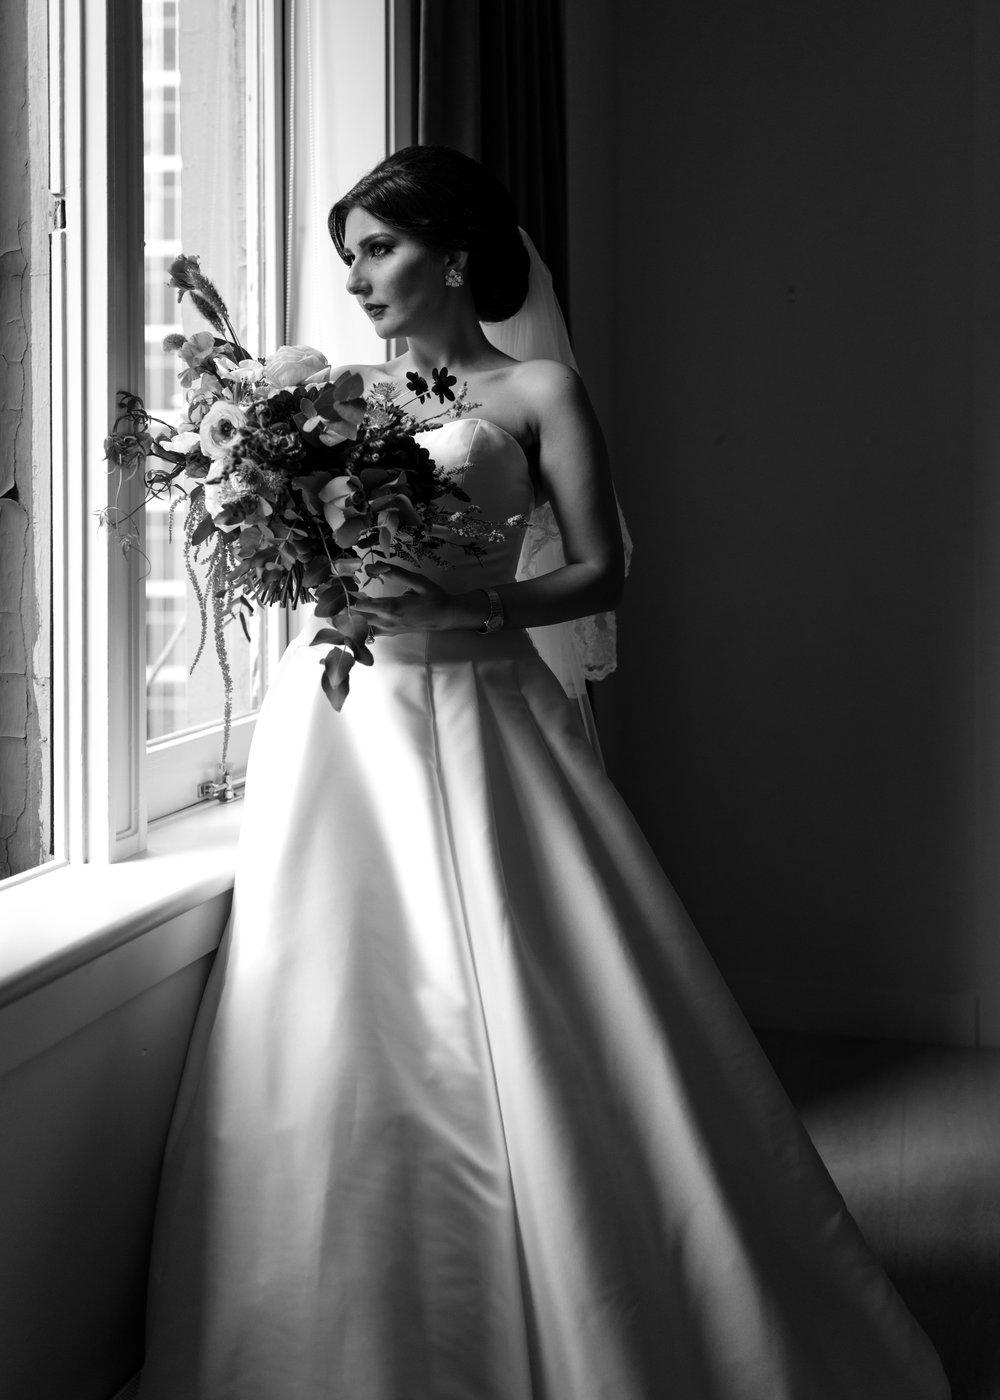 herastudios_wedding_mina_sina_hera_selects-31.jpg